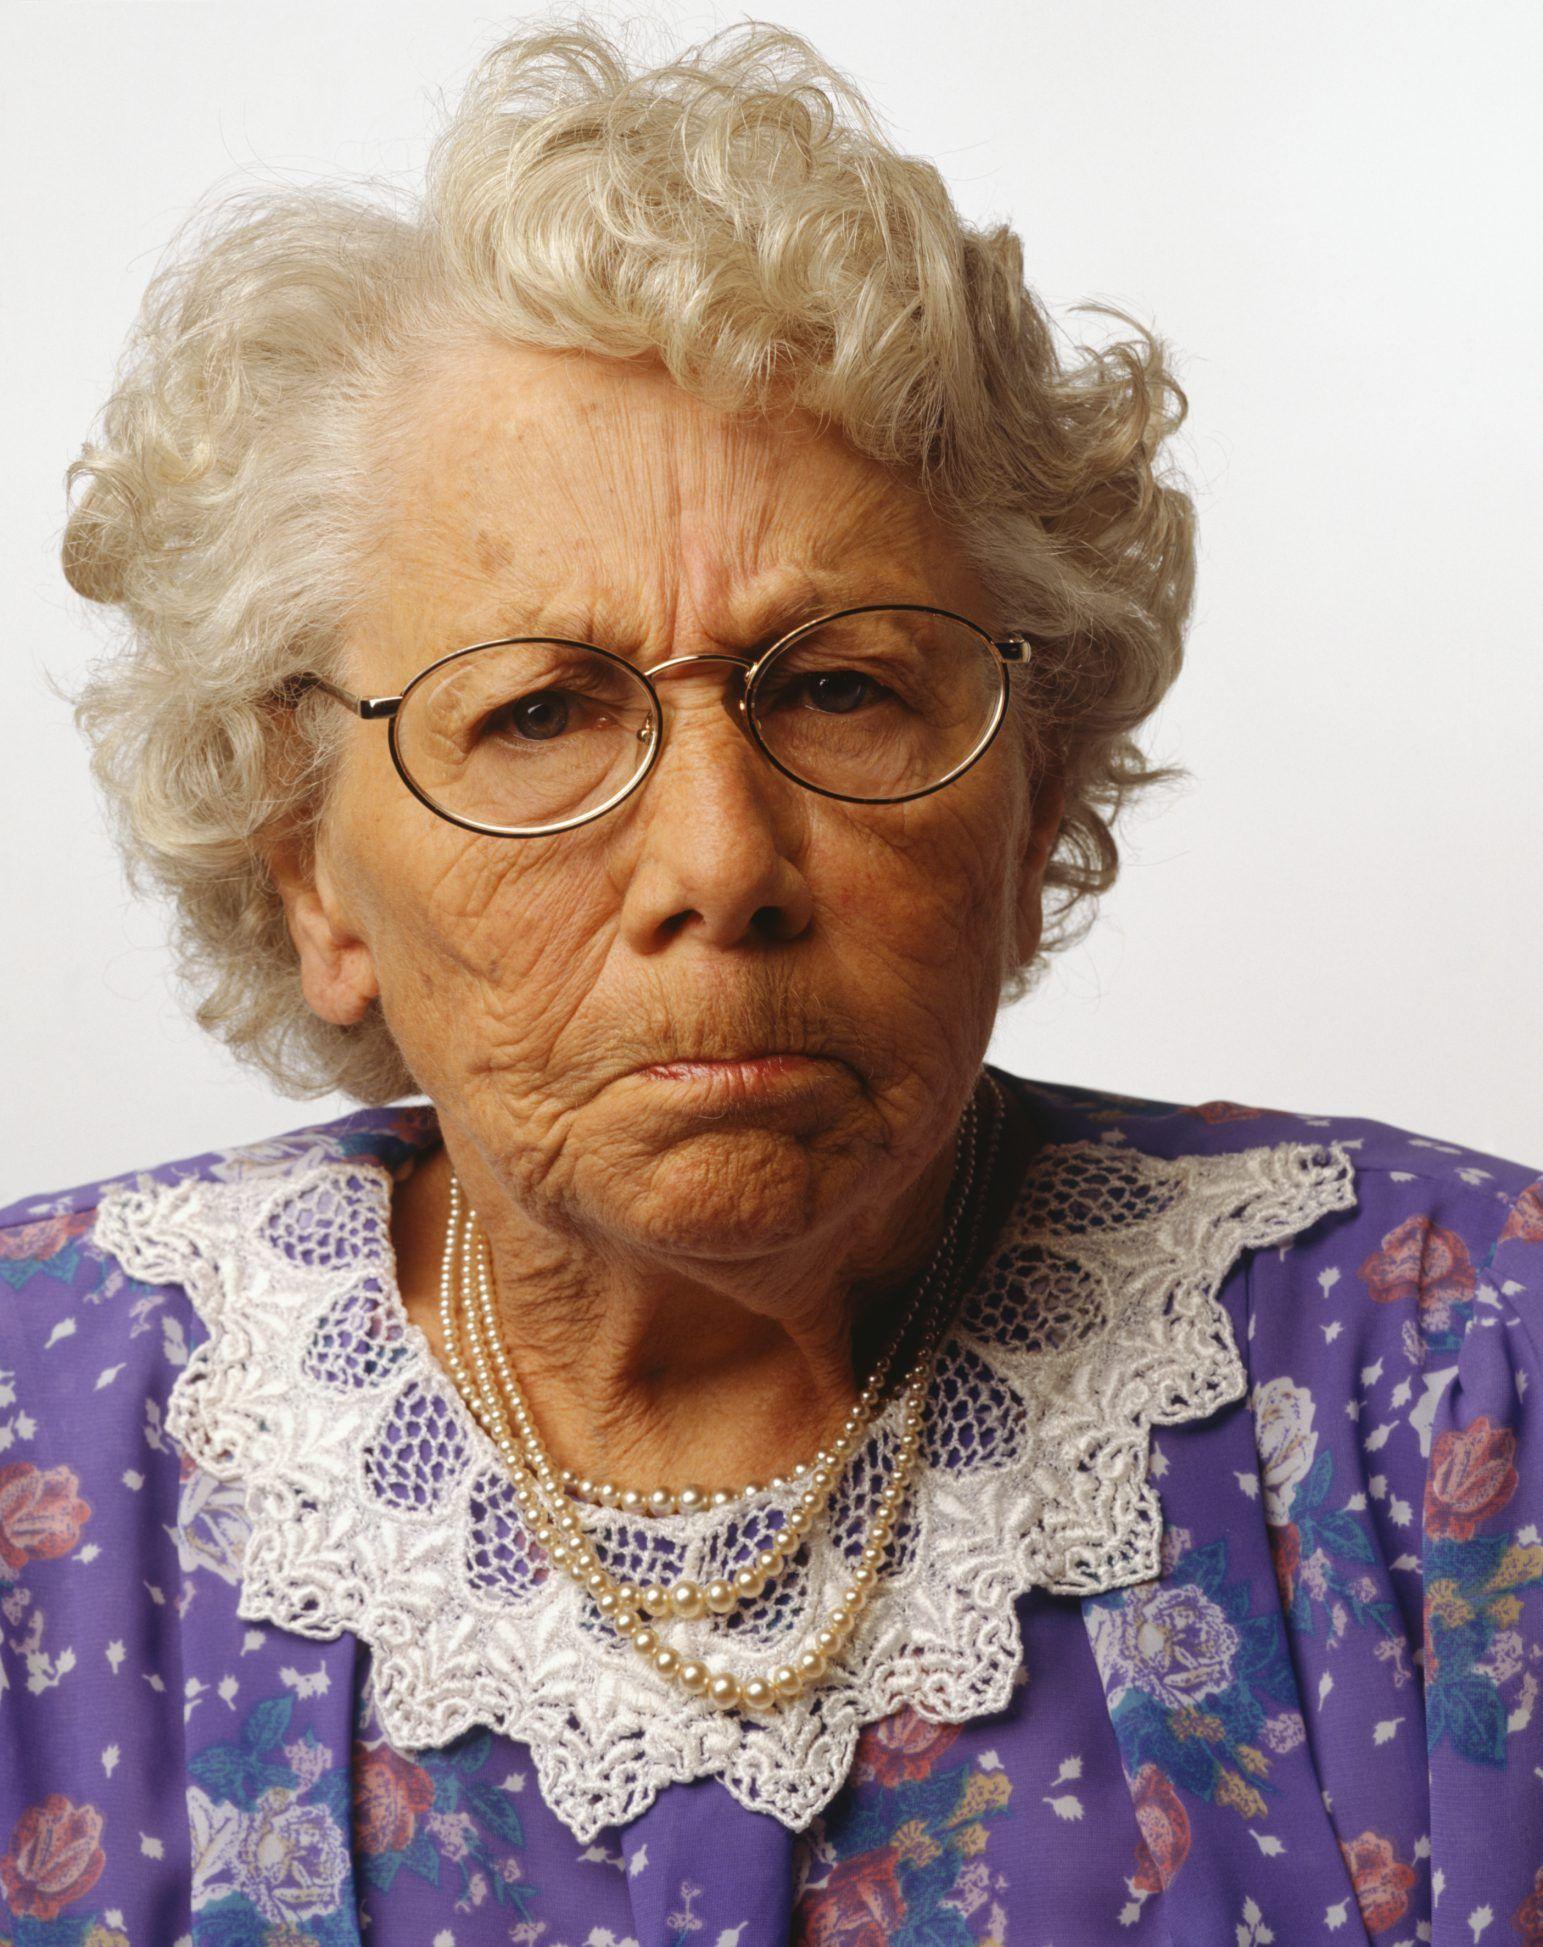 Old lady saggy boobs